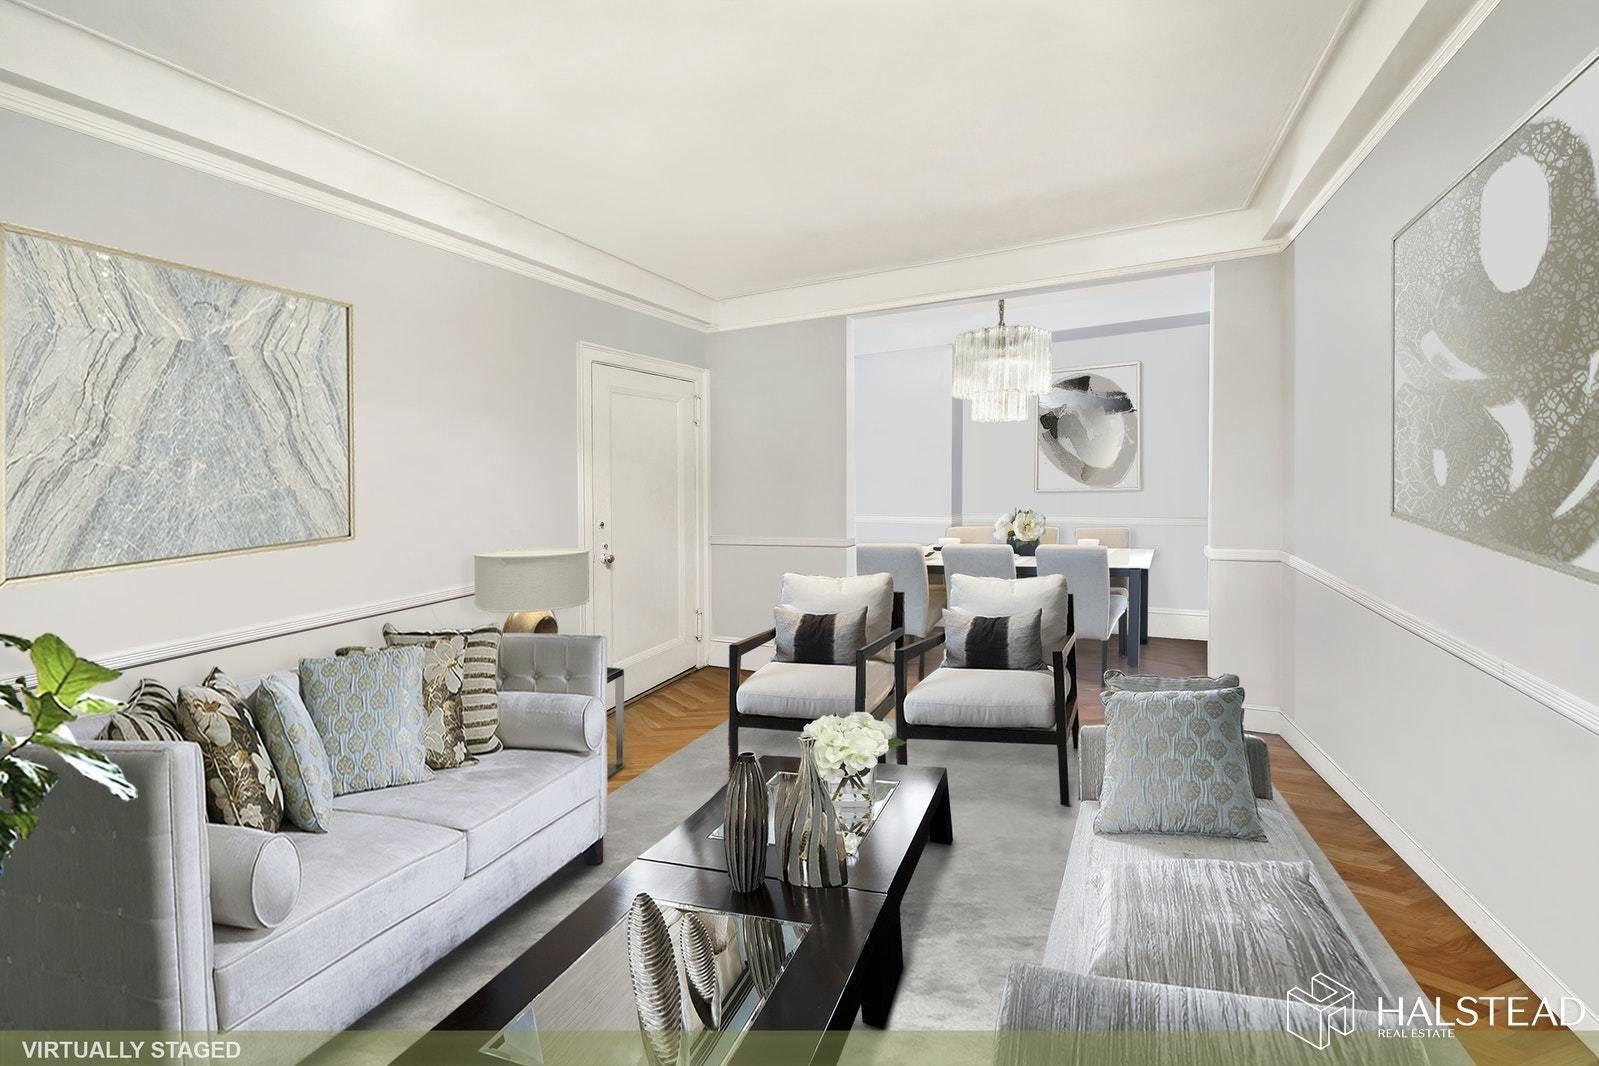 Apartment for sale at 1050 Park Avenue, Apt MEDICAL